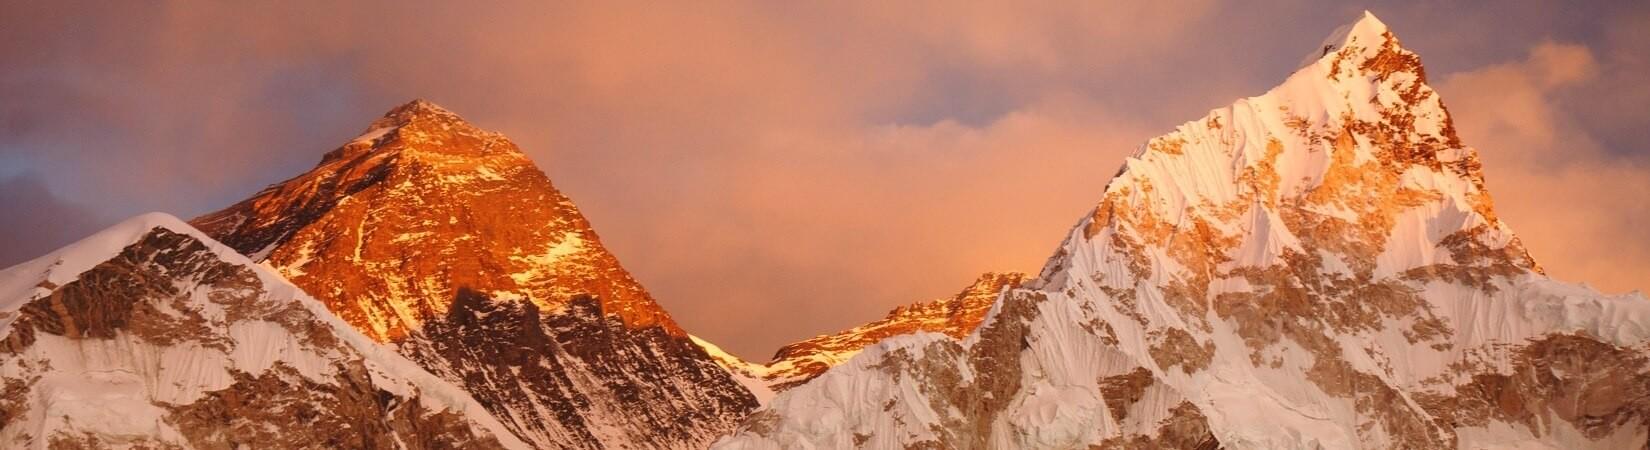 Everest Base Camp Trek and Bhutan Tour